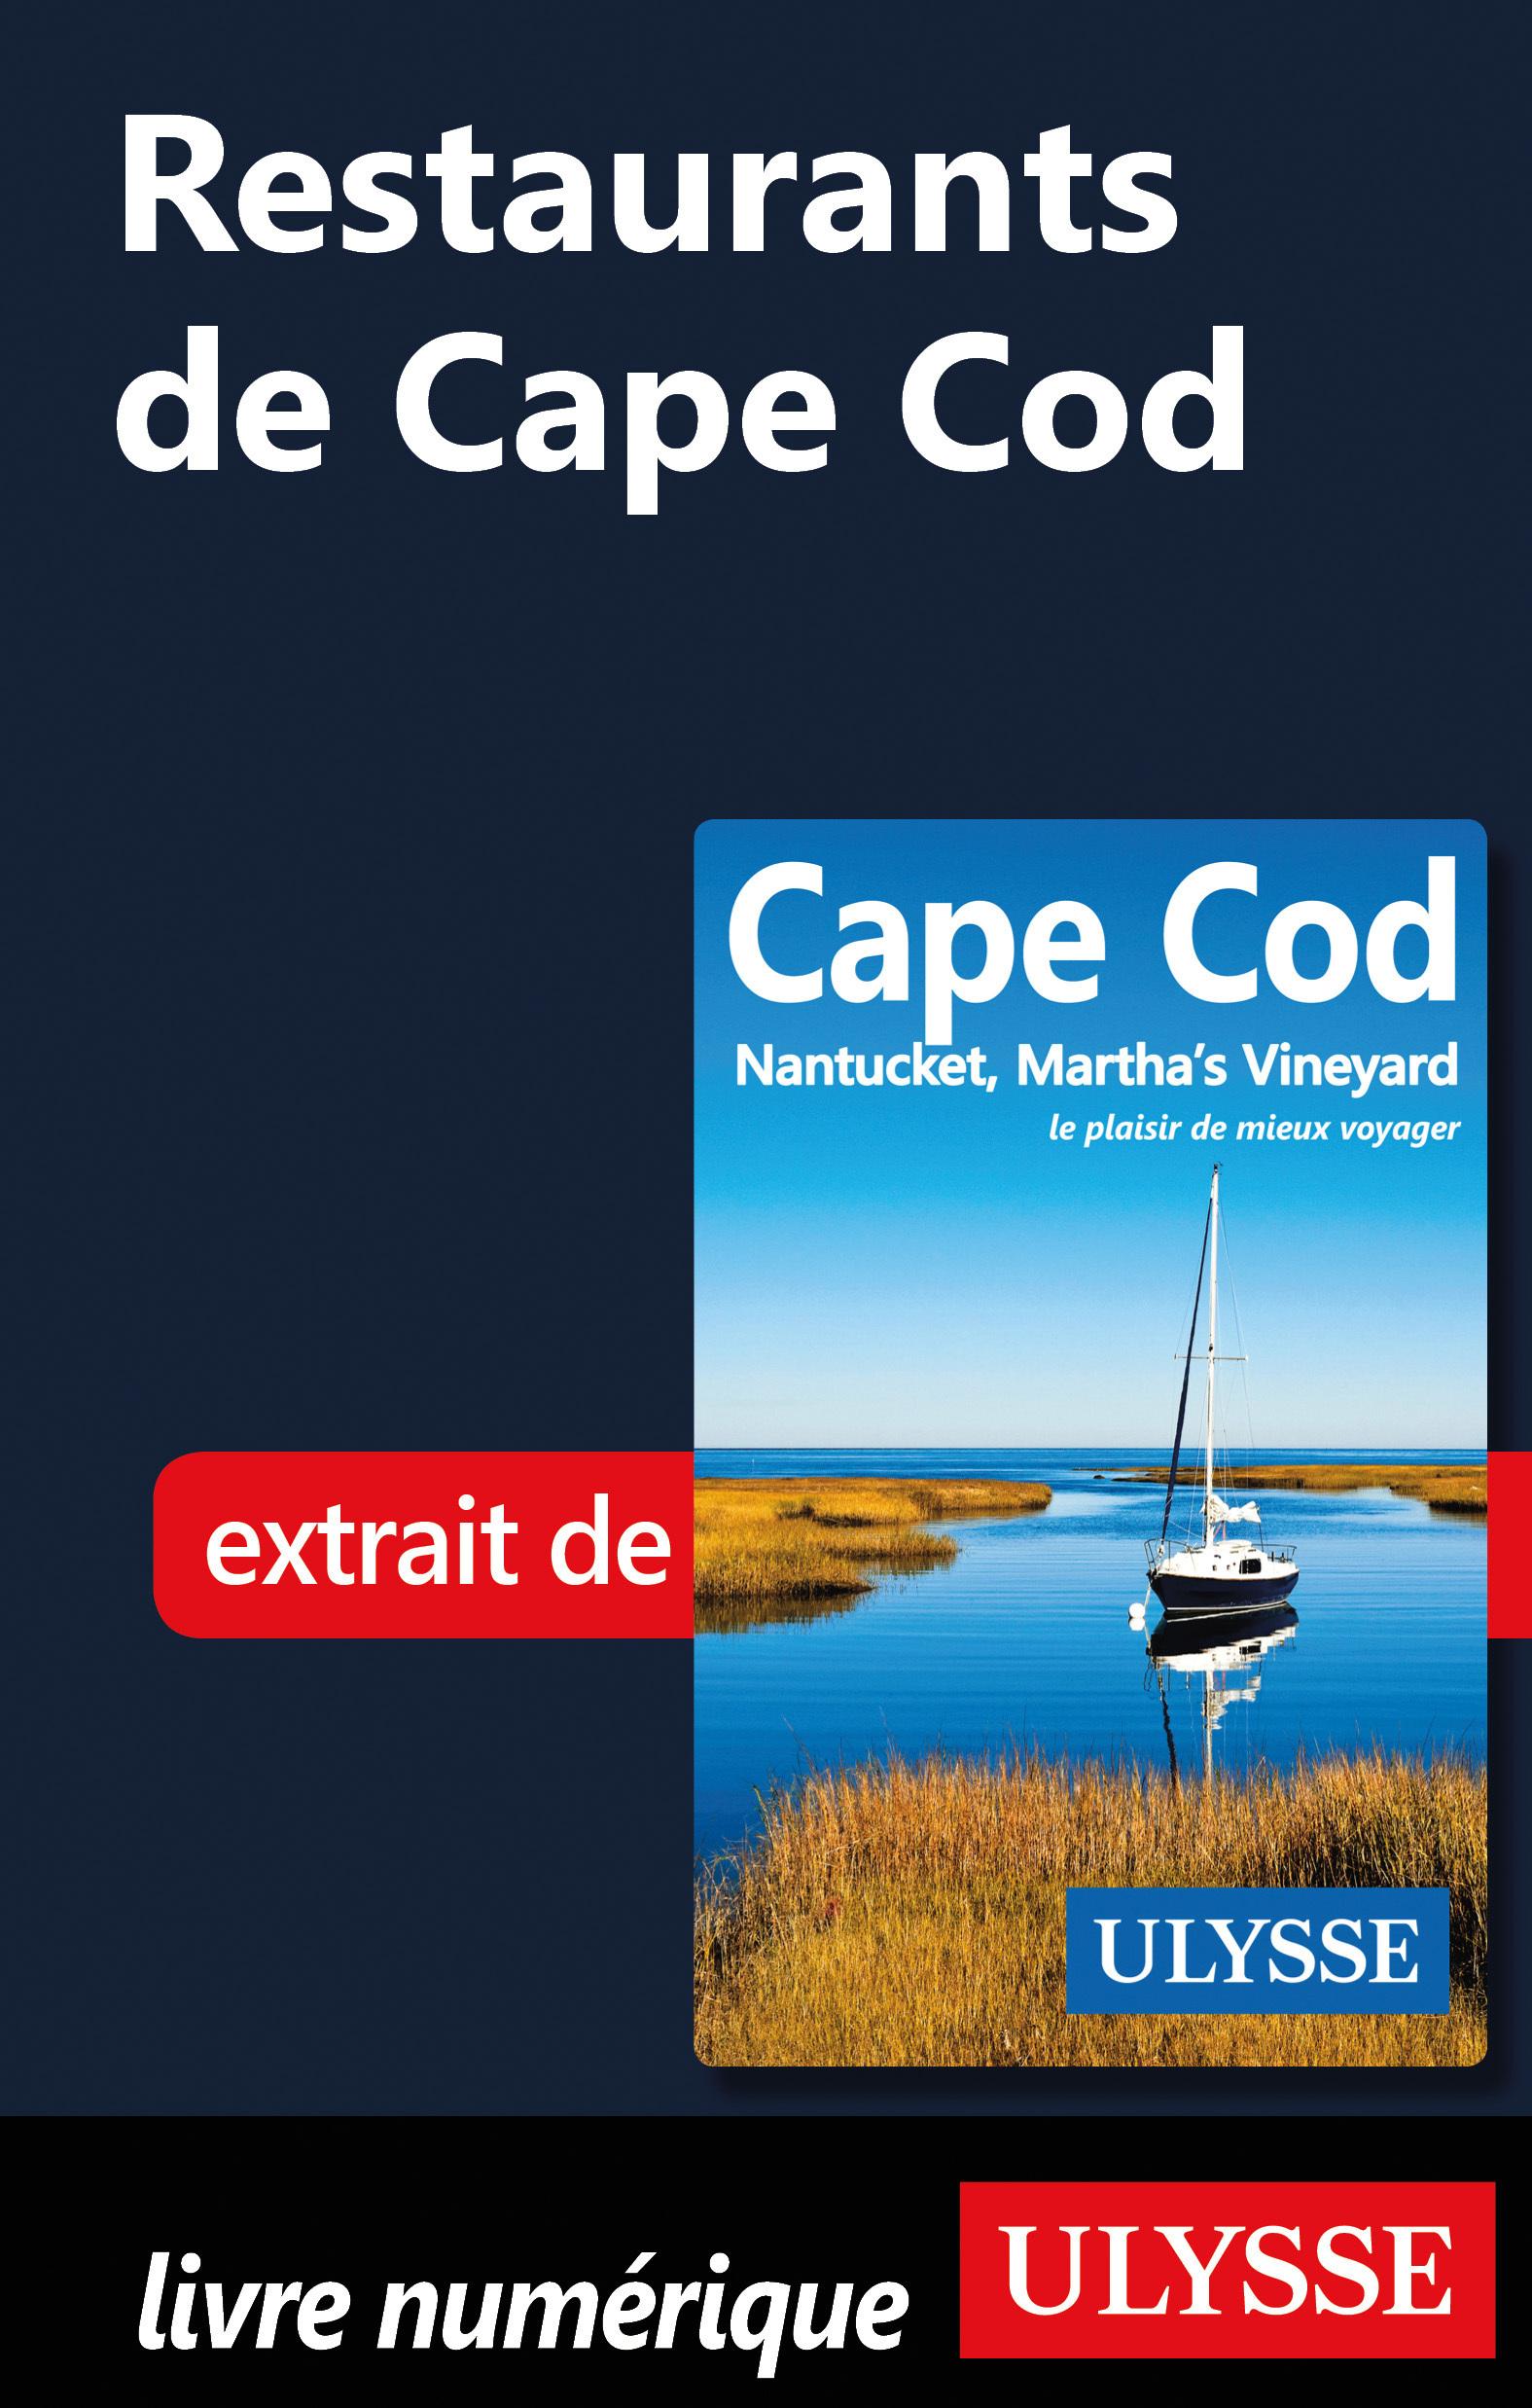 Restaurants de Cape Cod